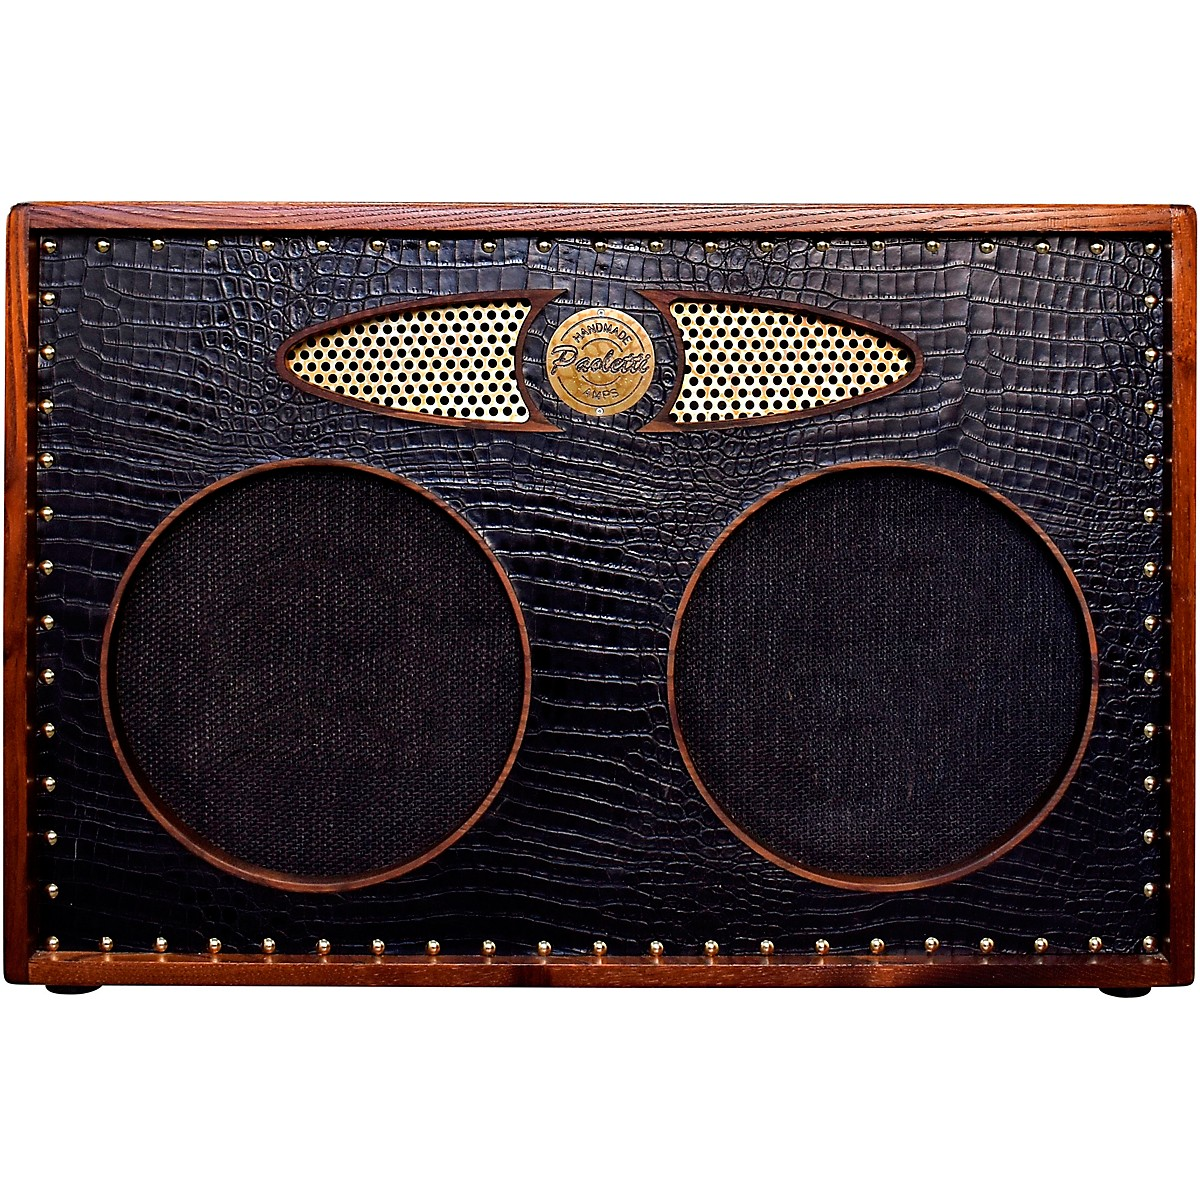 Paoletti Guitars Brutale Extension 140W 2x12 Guitar Speaker Cabinet